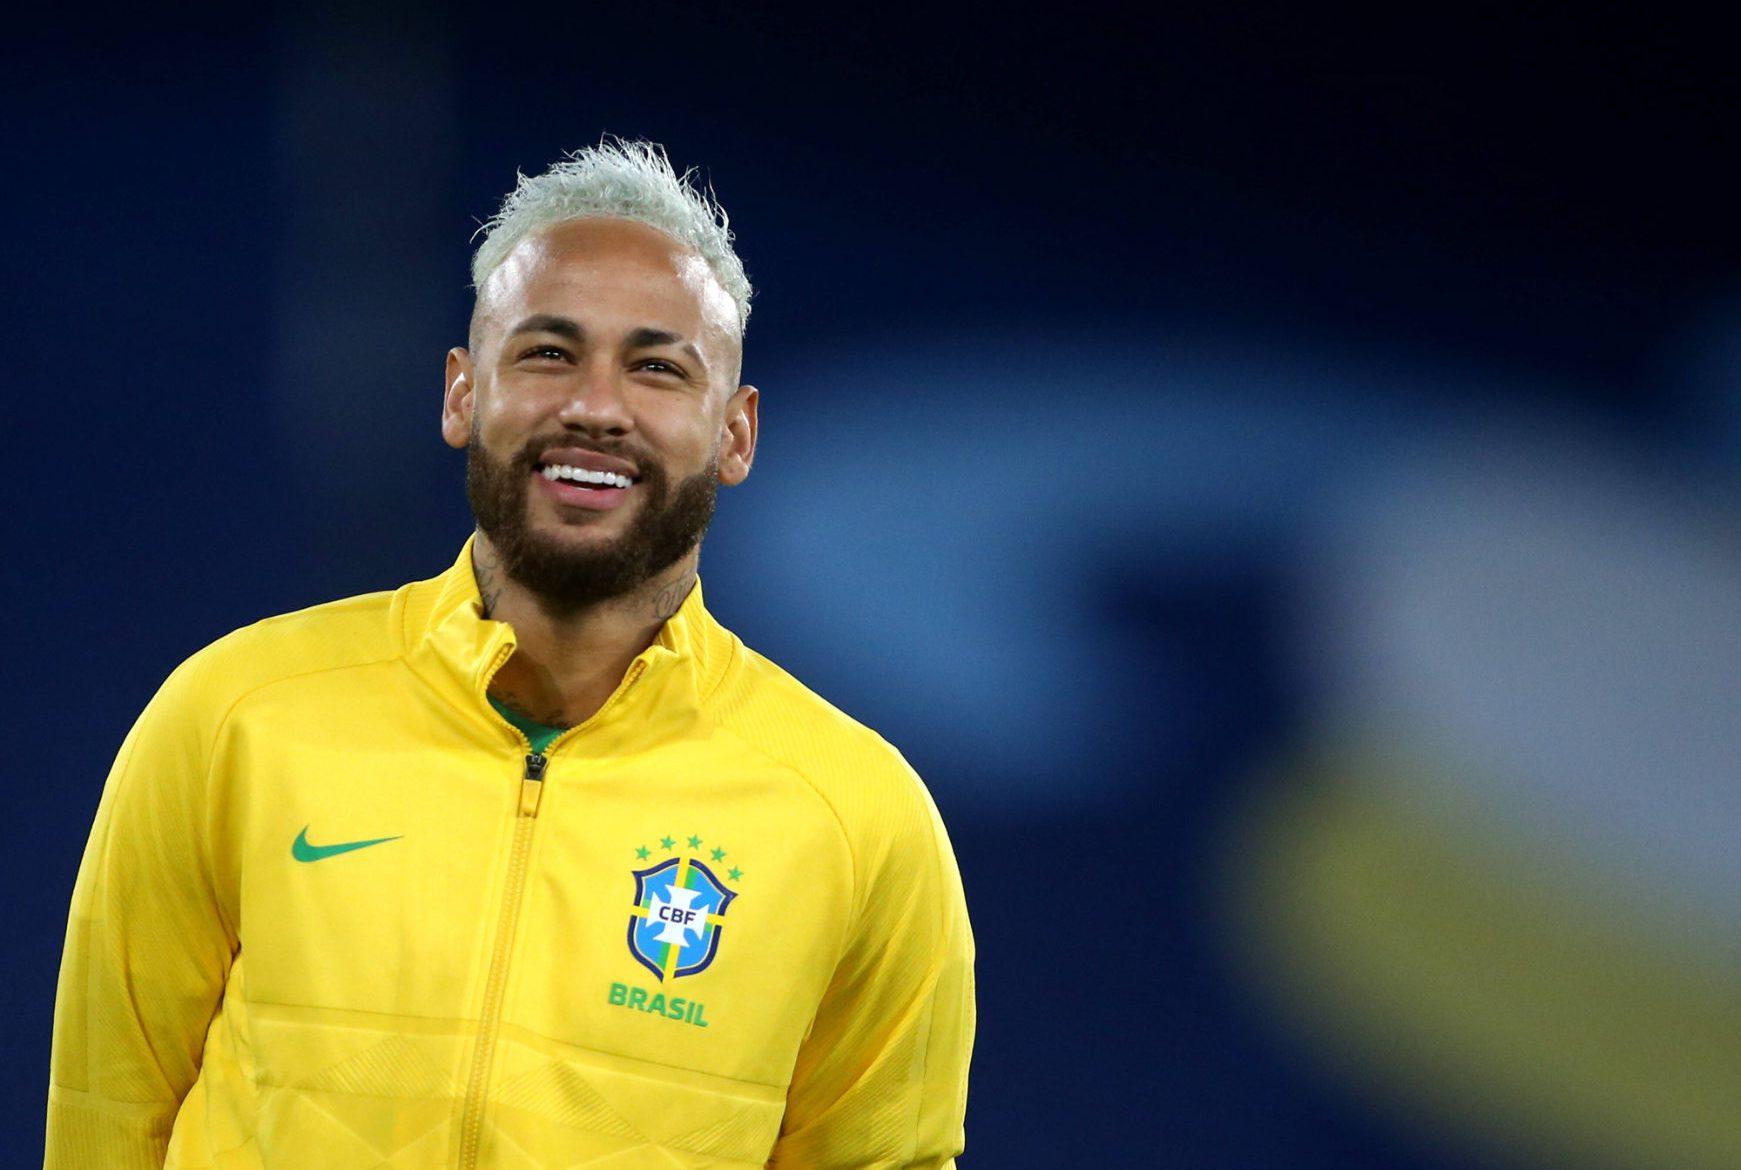 Famous Footballer